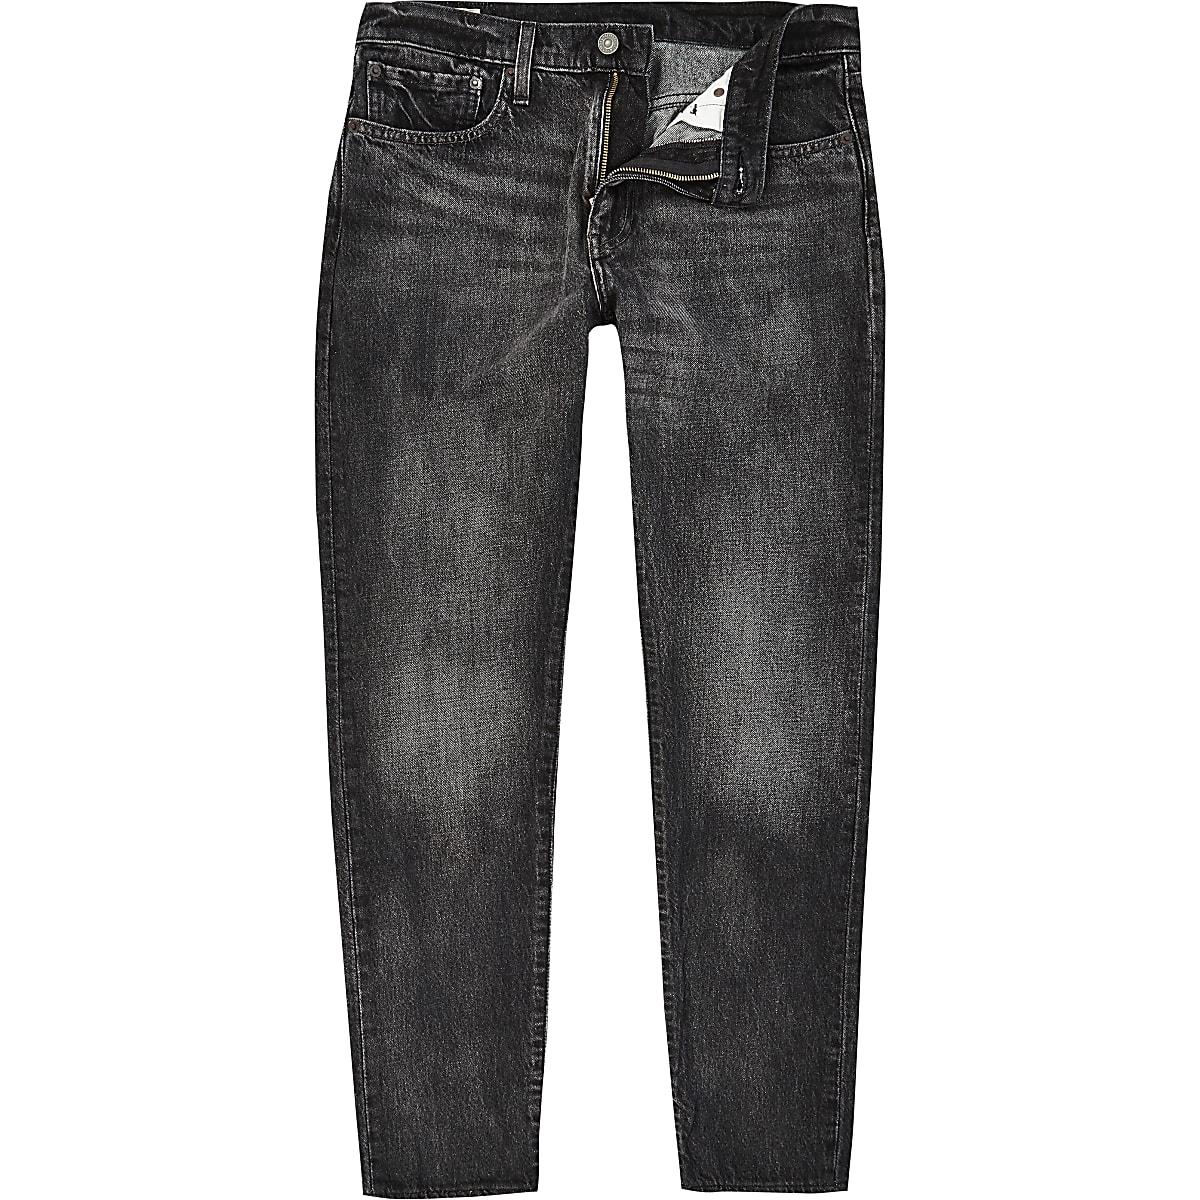 52a9041a6a0 Levi's black denim 512 slim taper fit jeans - Slim Jeans - Jeans - men